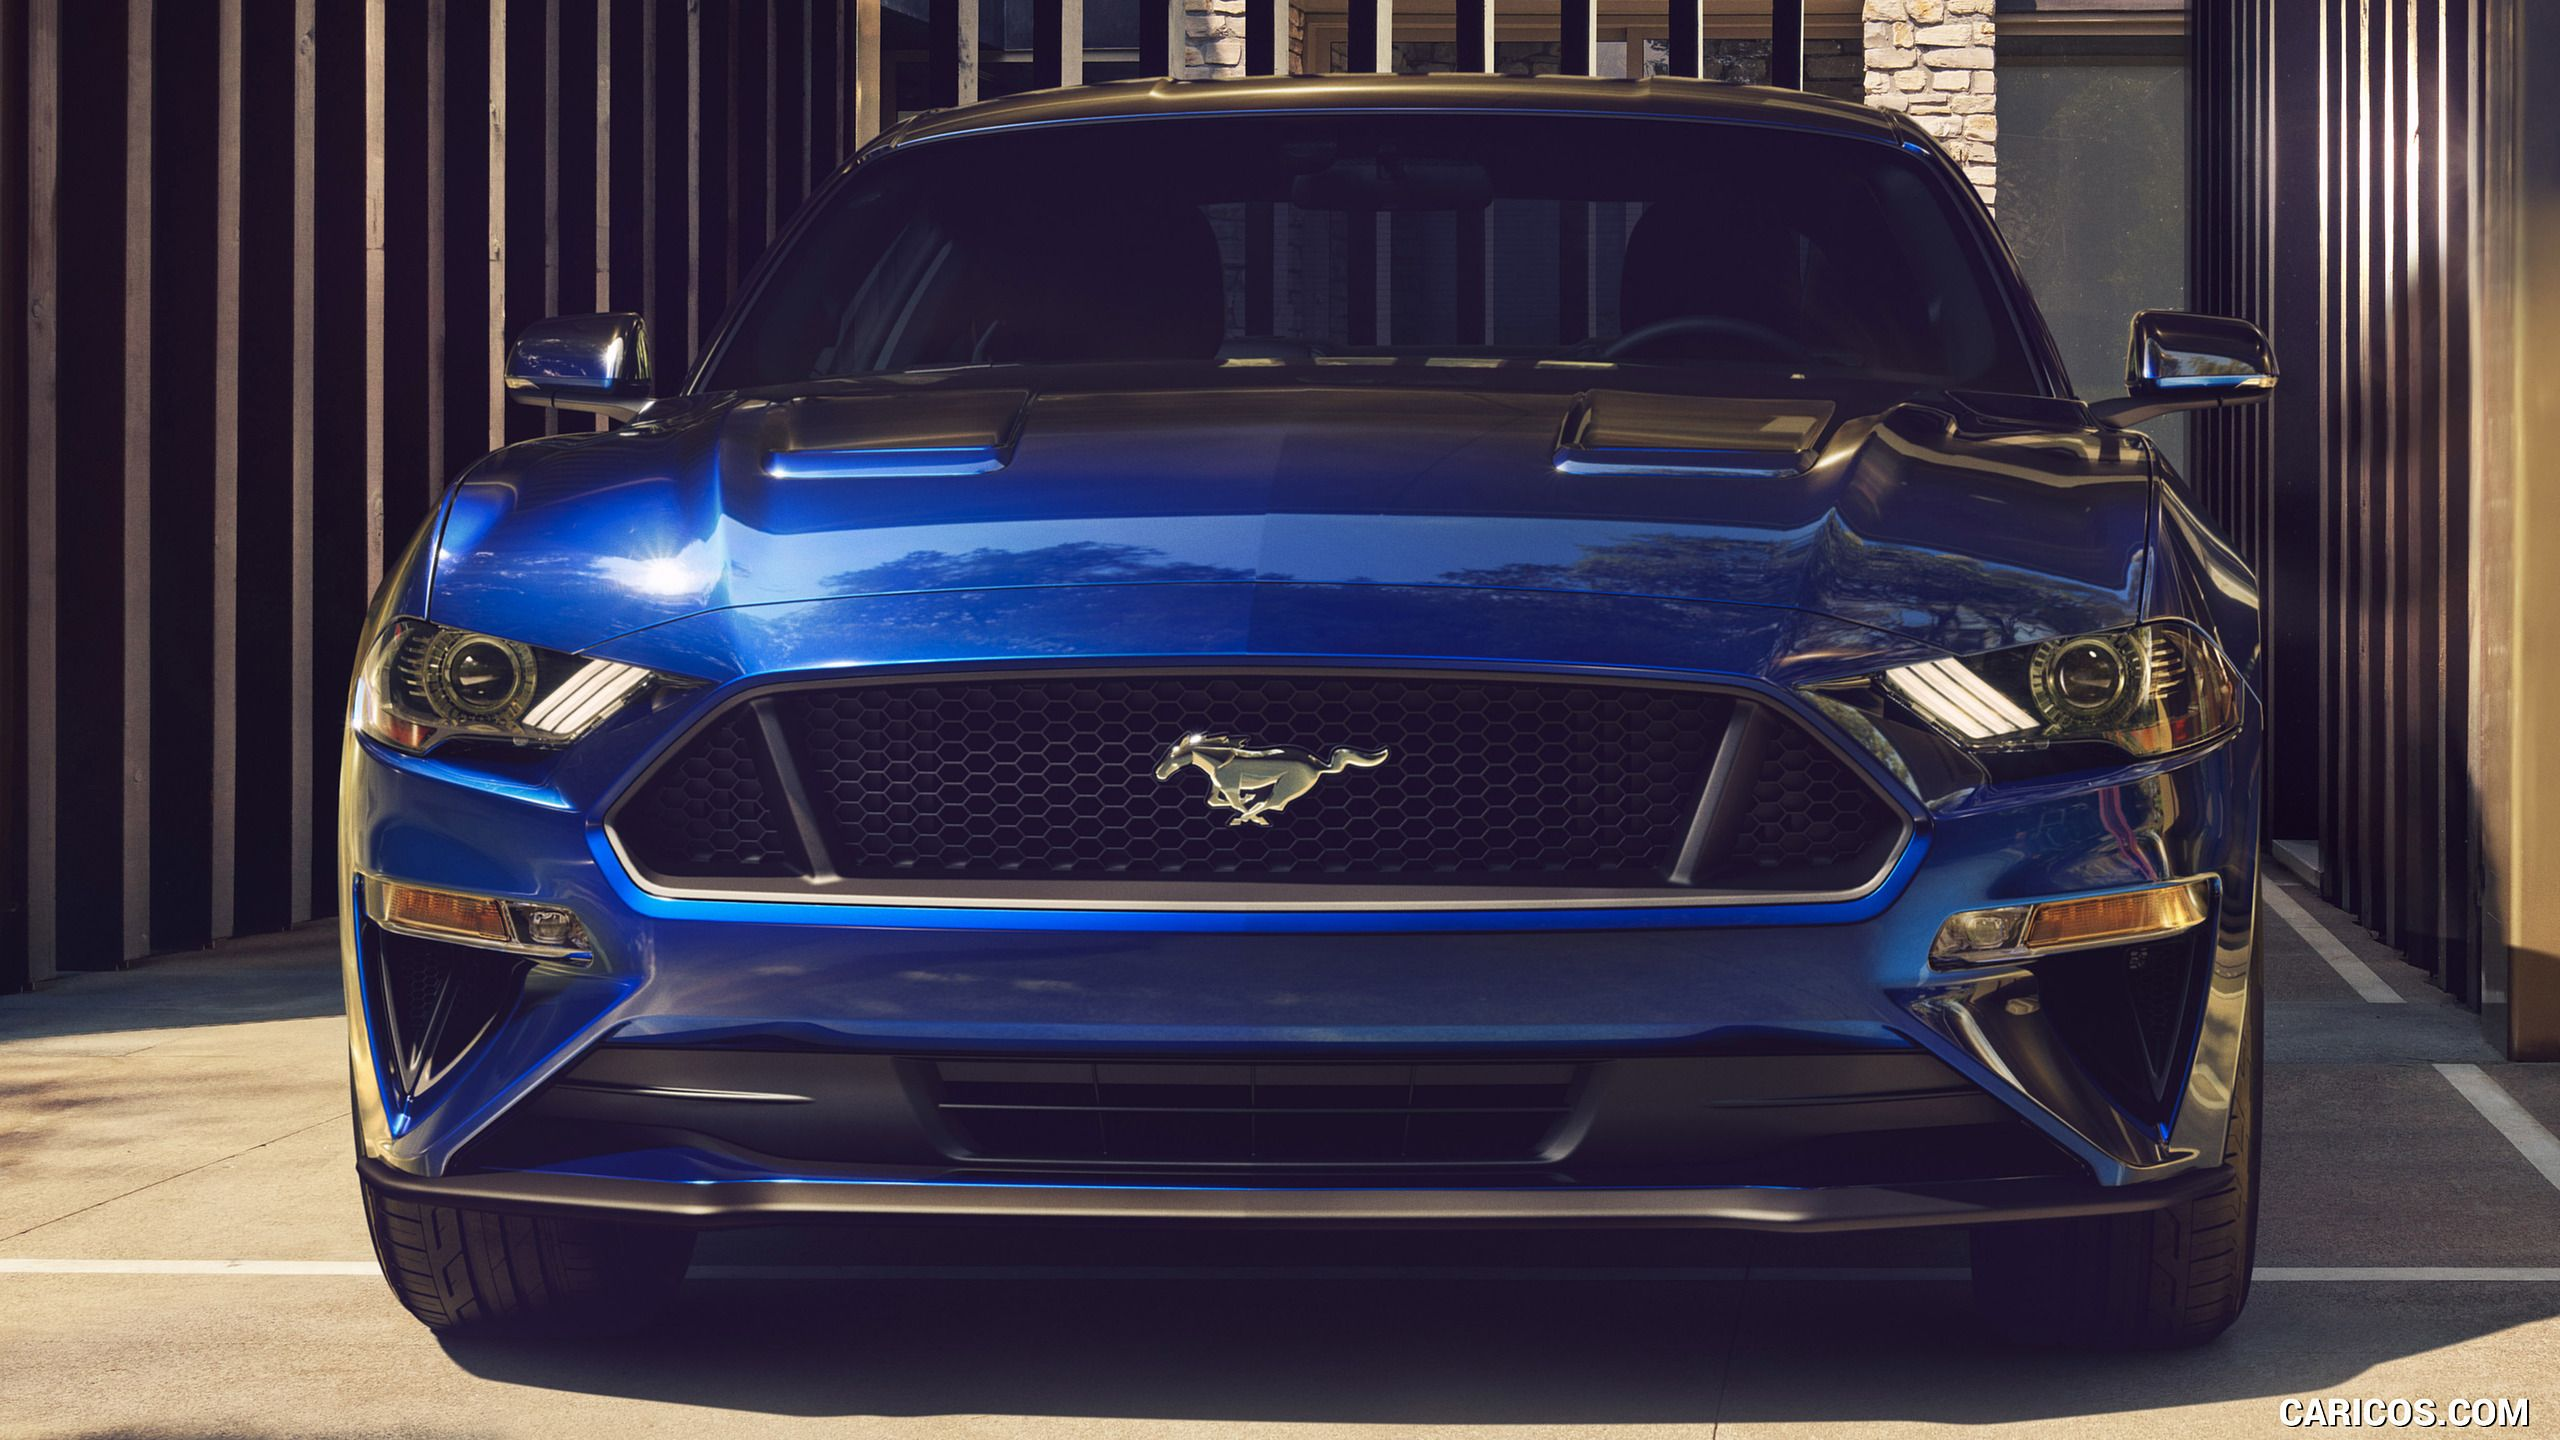 2018 Ford Mustang Wallpaper Ford Mustang Bullitt Ford Mustang Convertible Ford Mustang 2018